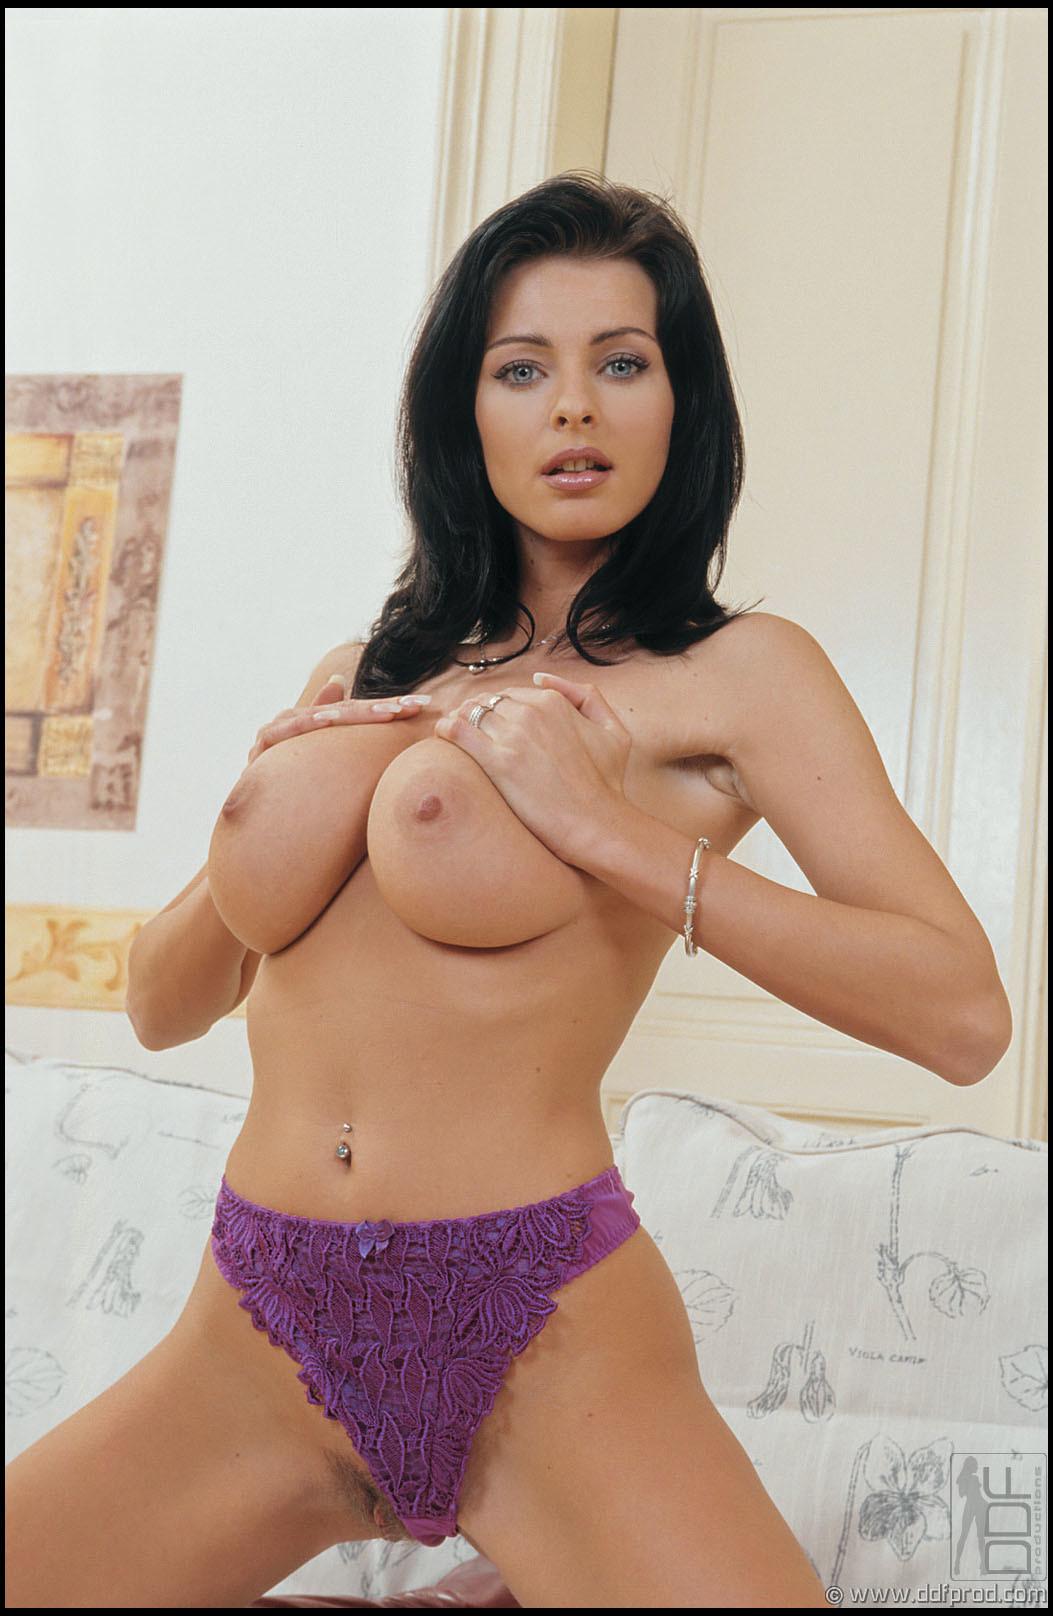 Luisa rosselini movies pornstar, michelle lynn upskirt